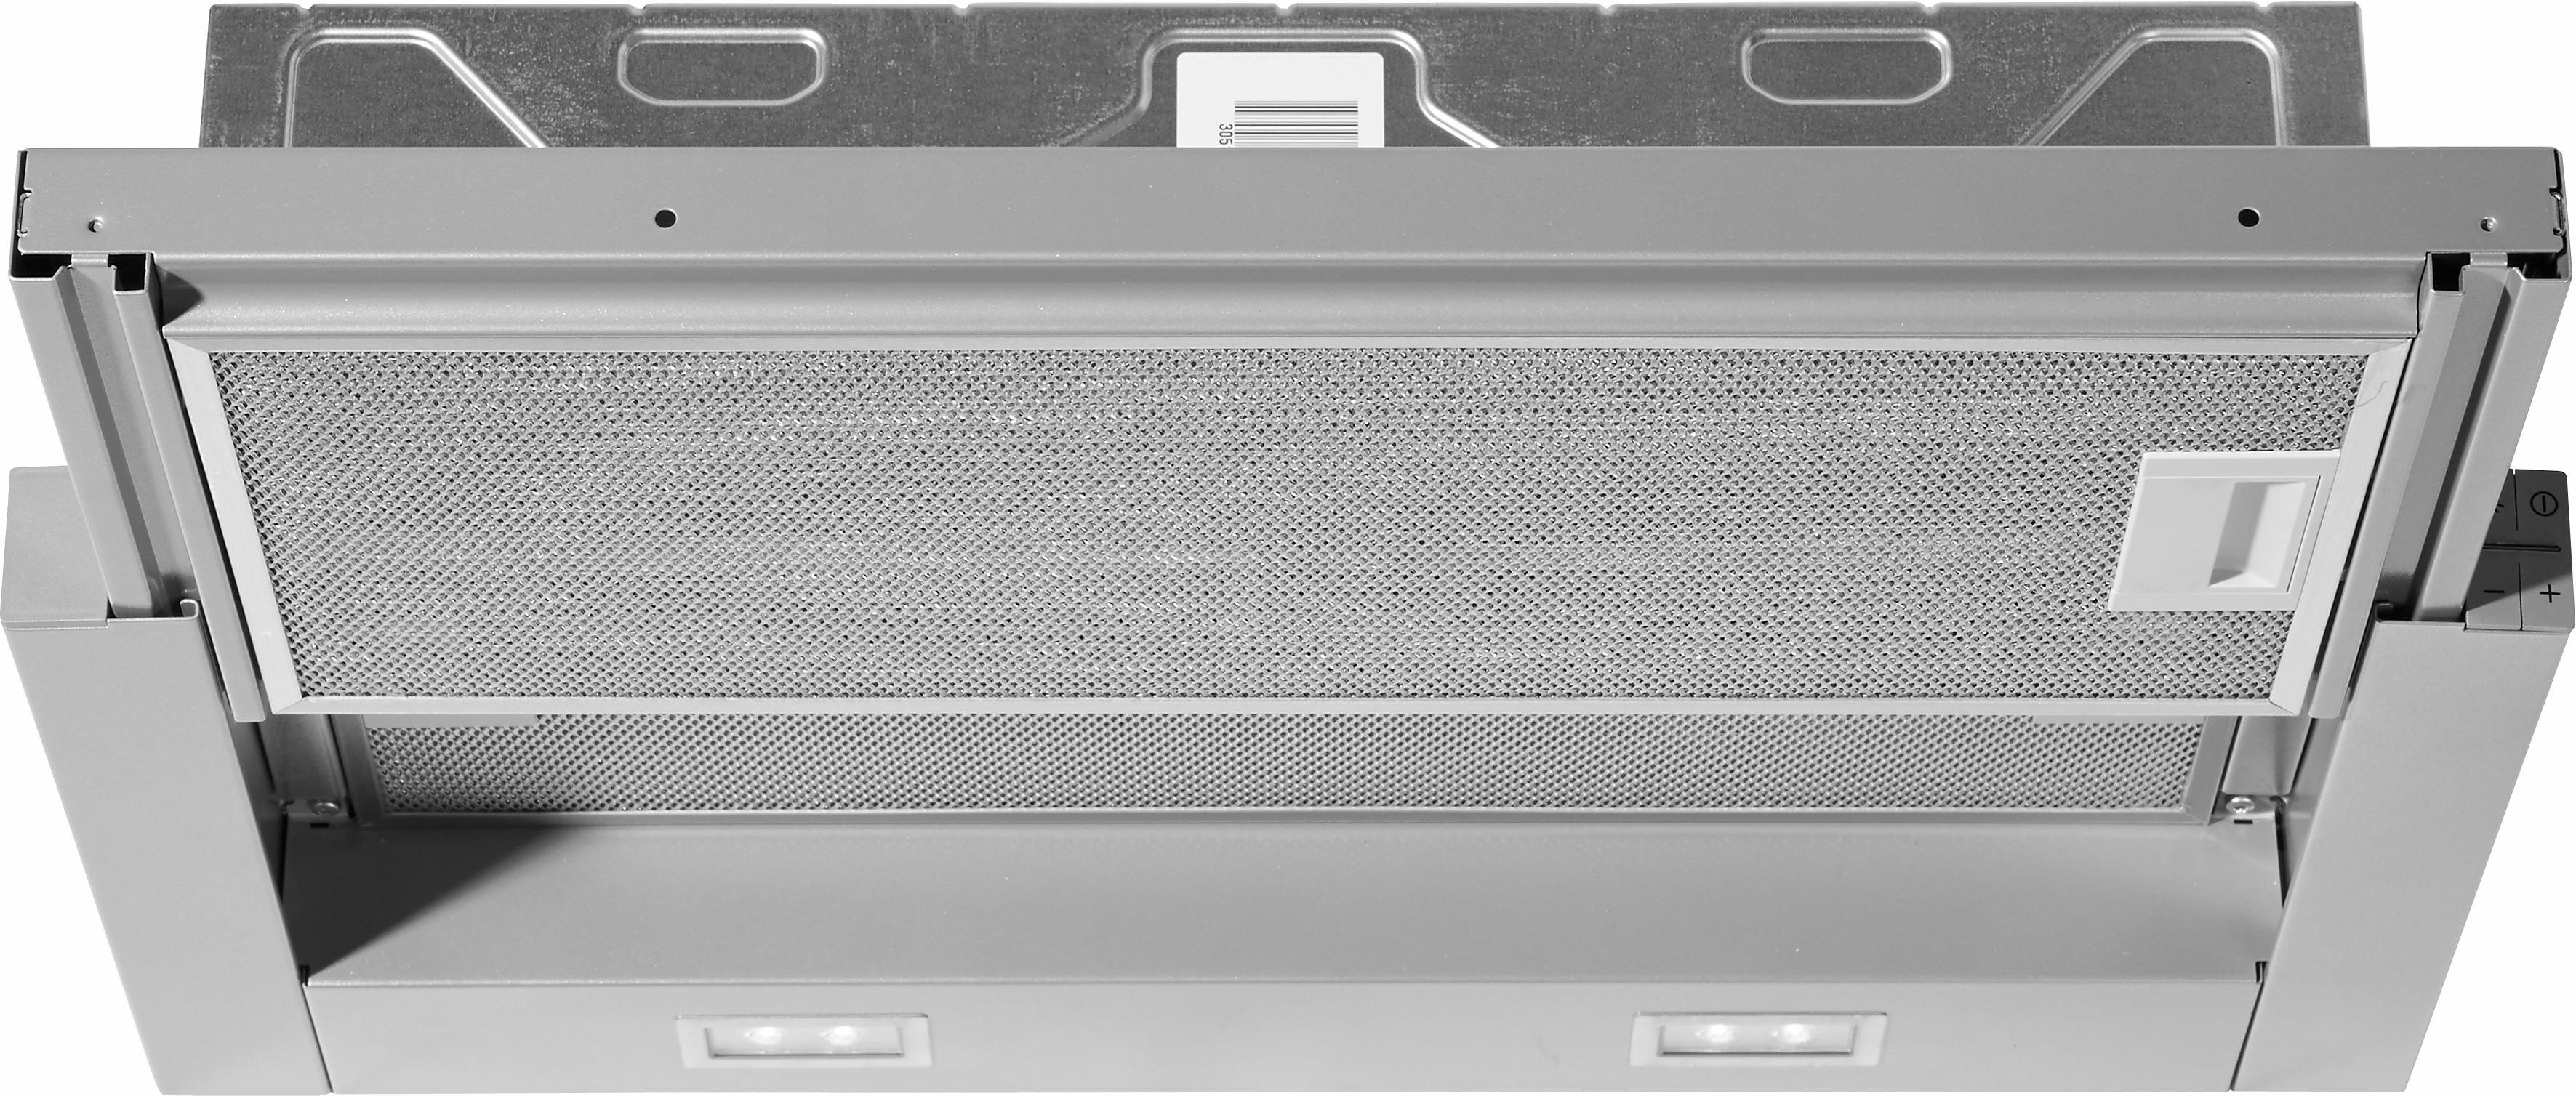 Siemens Flachschirmhaube LI64LA530, A